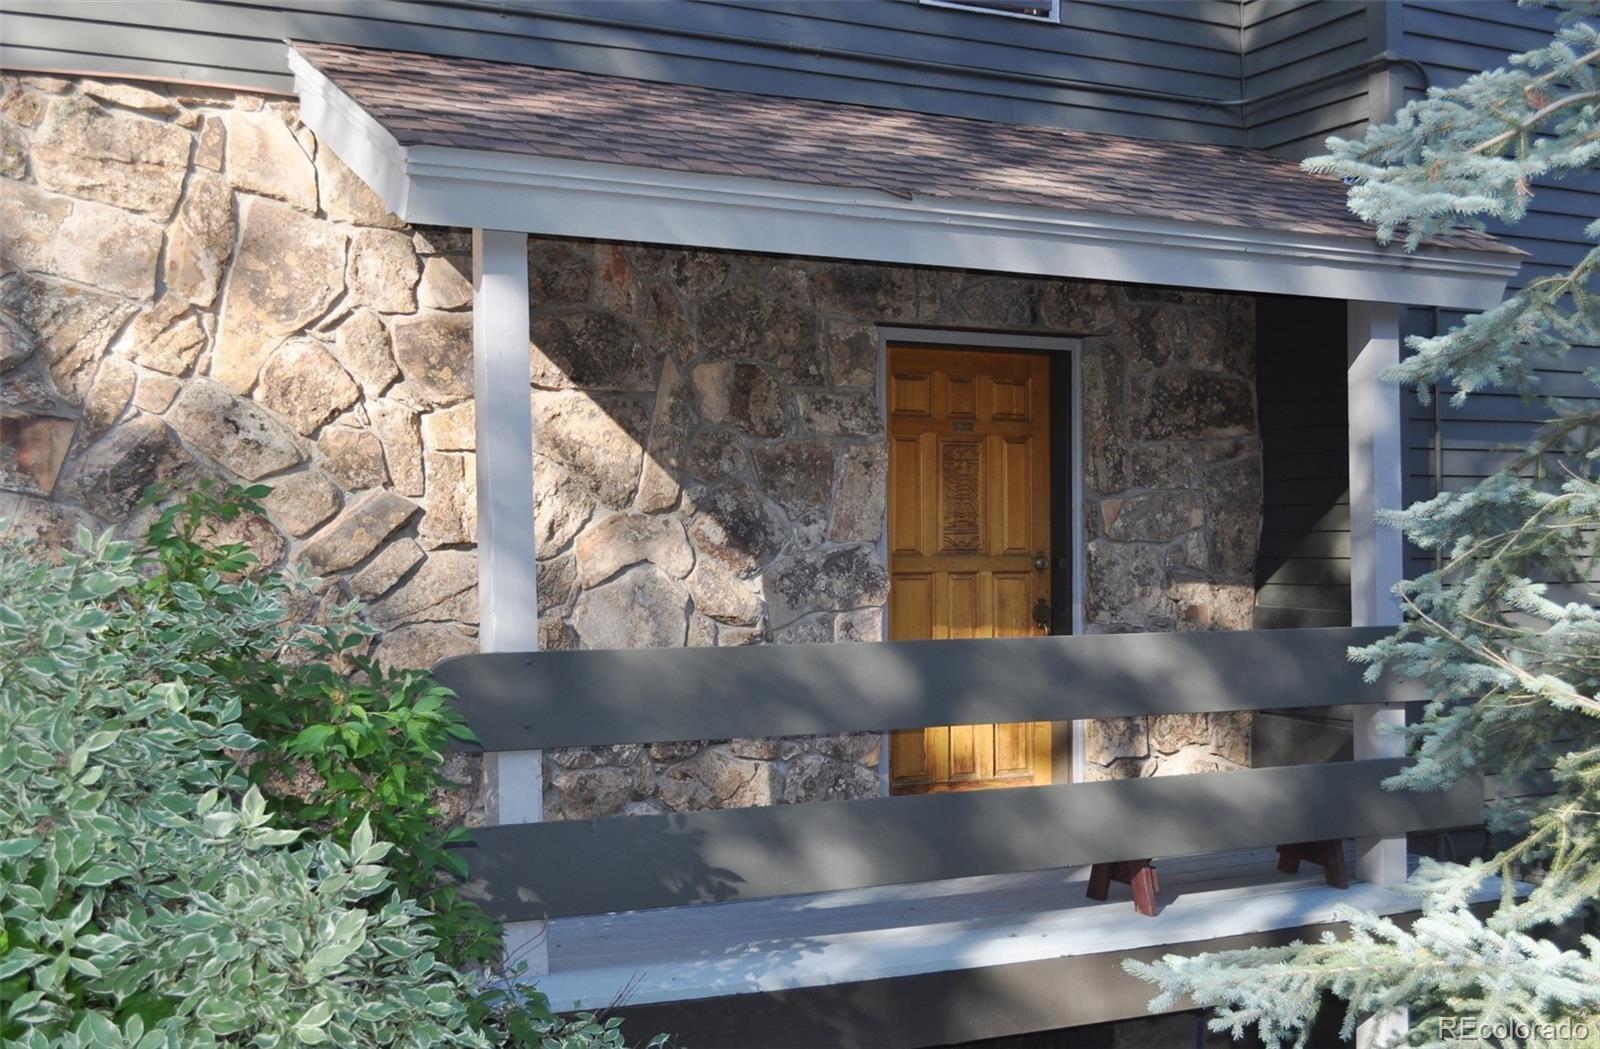 MLS# 2309963 - 4 - 1145 Overlook Drive #C1, Steamboat Springs, CO 80487